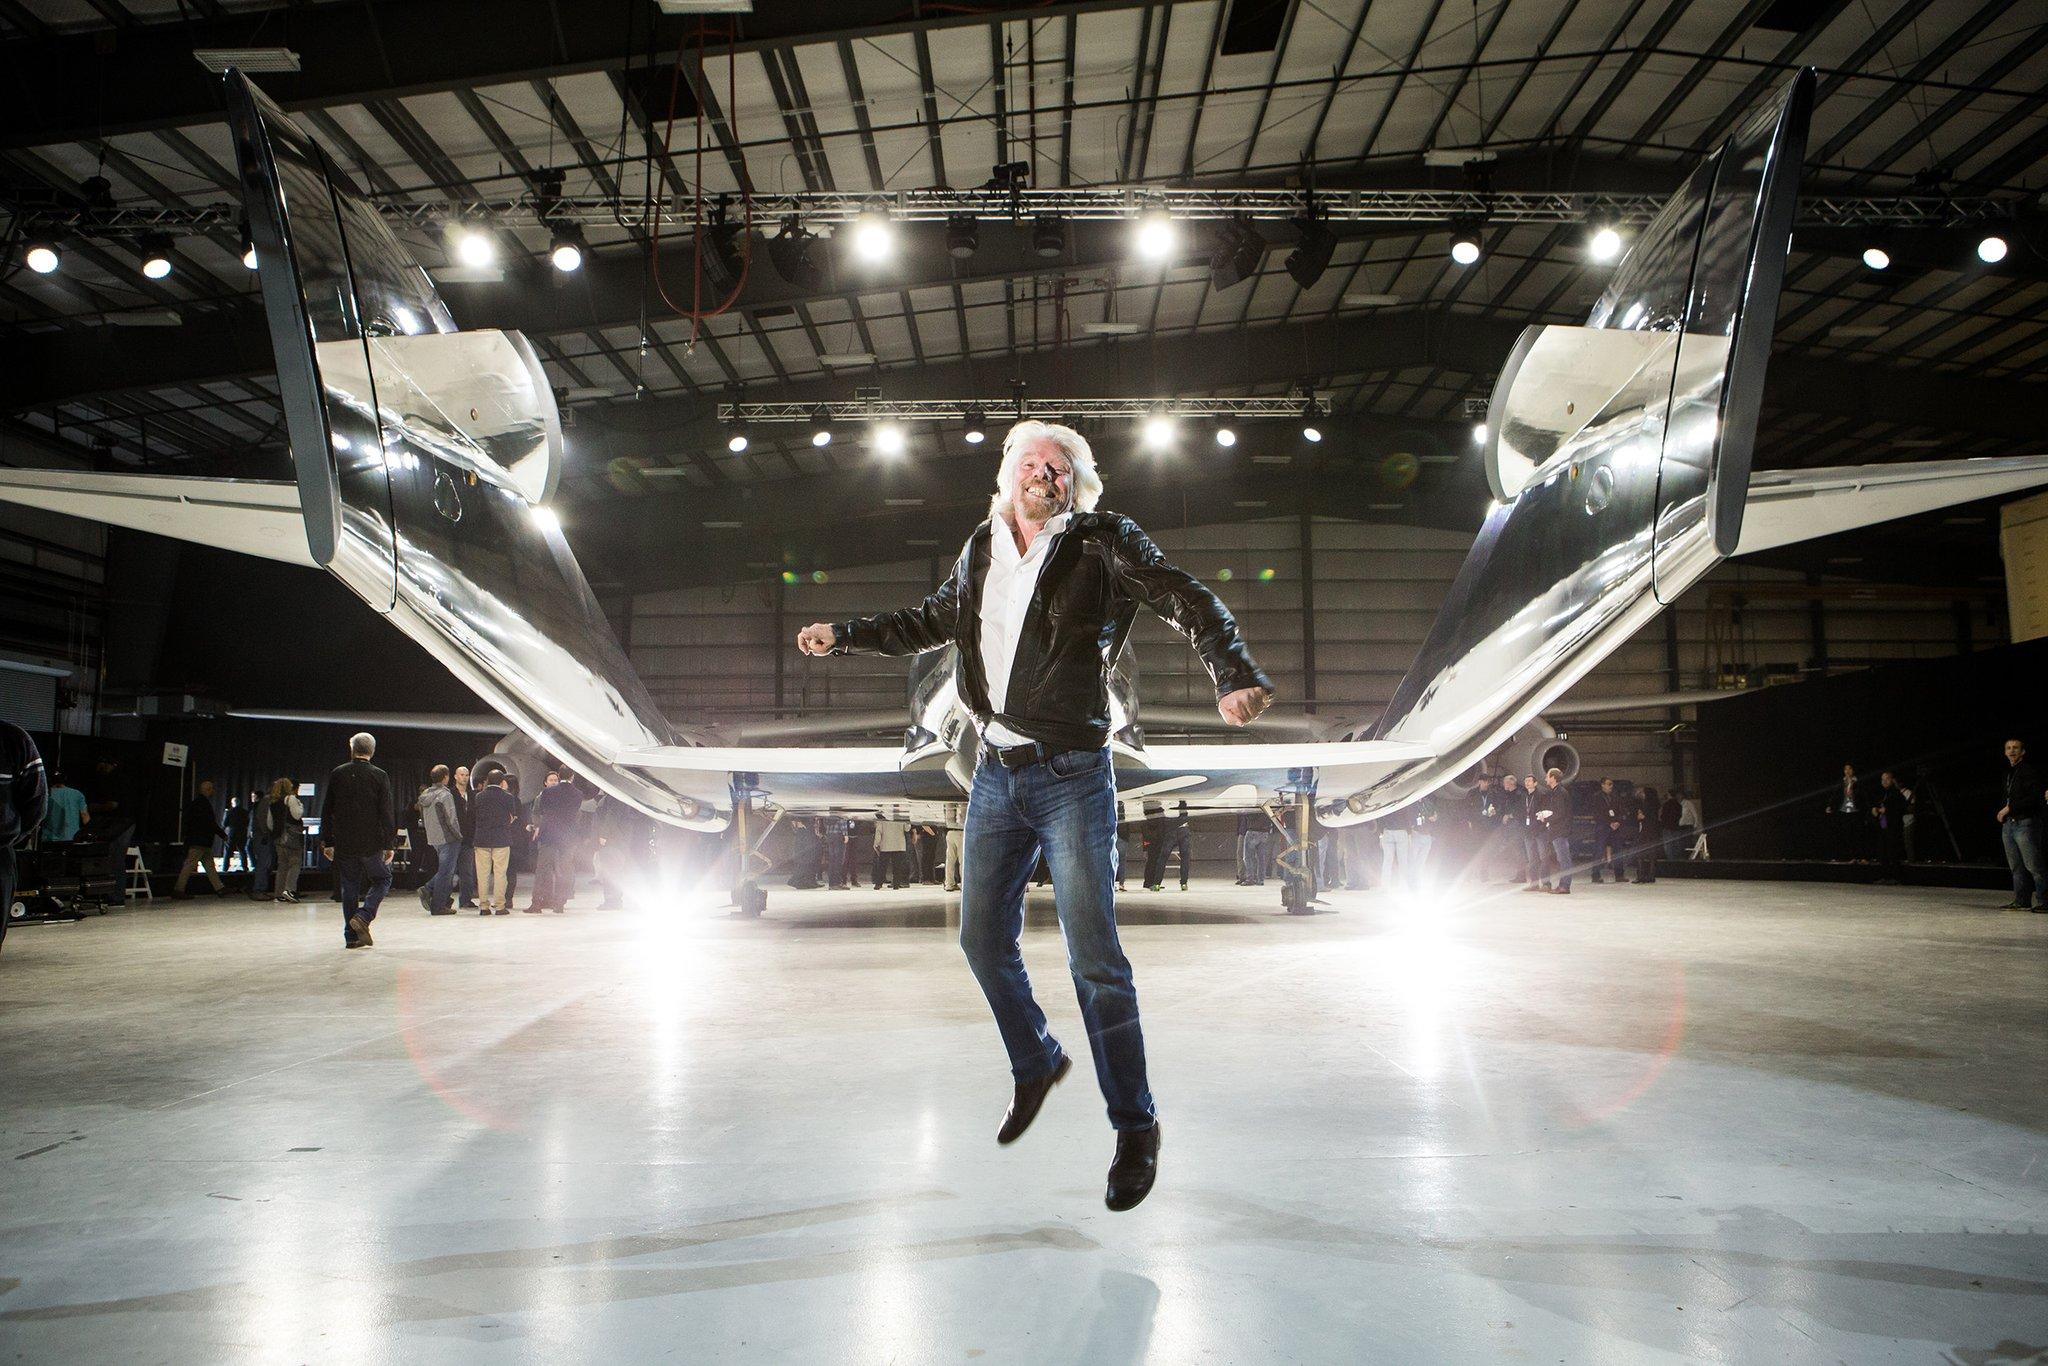 SPACEMAN Richard Branson : NEXT EXIT MARS